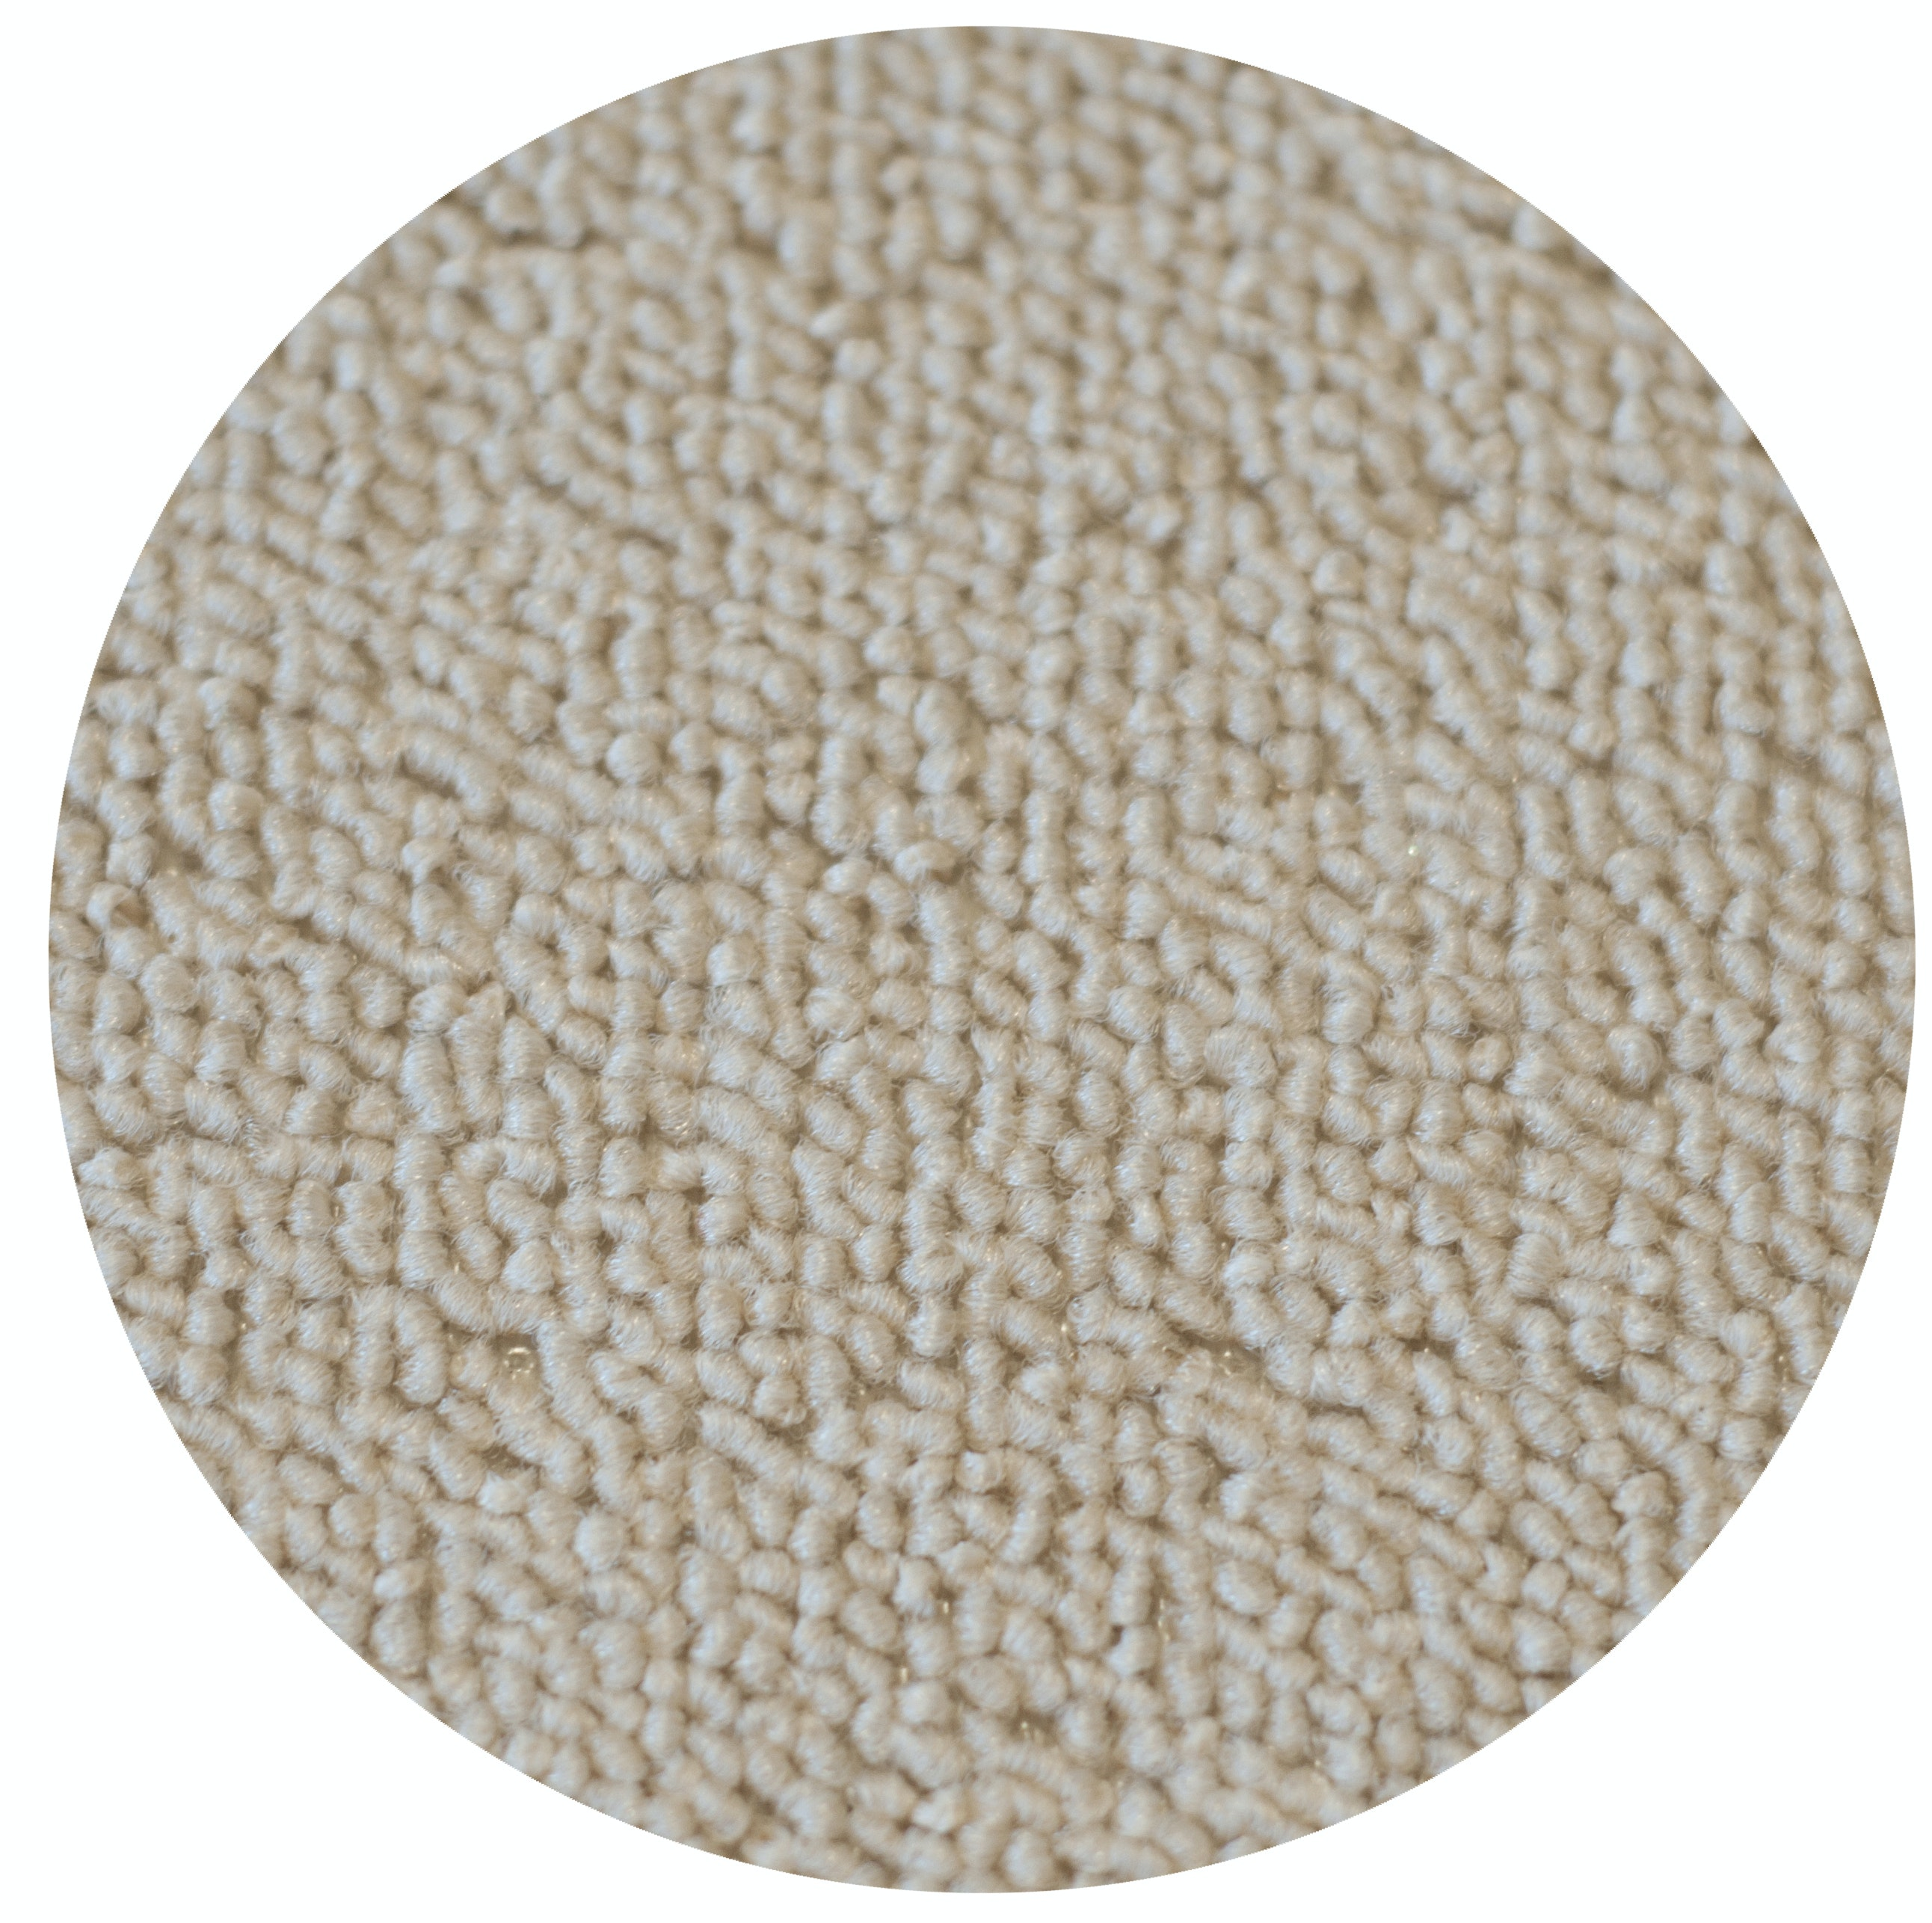 Textilgolv Heltäckningsmatta Fibertrone Basic 18 m² Beige 66